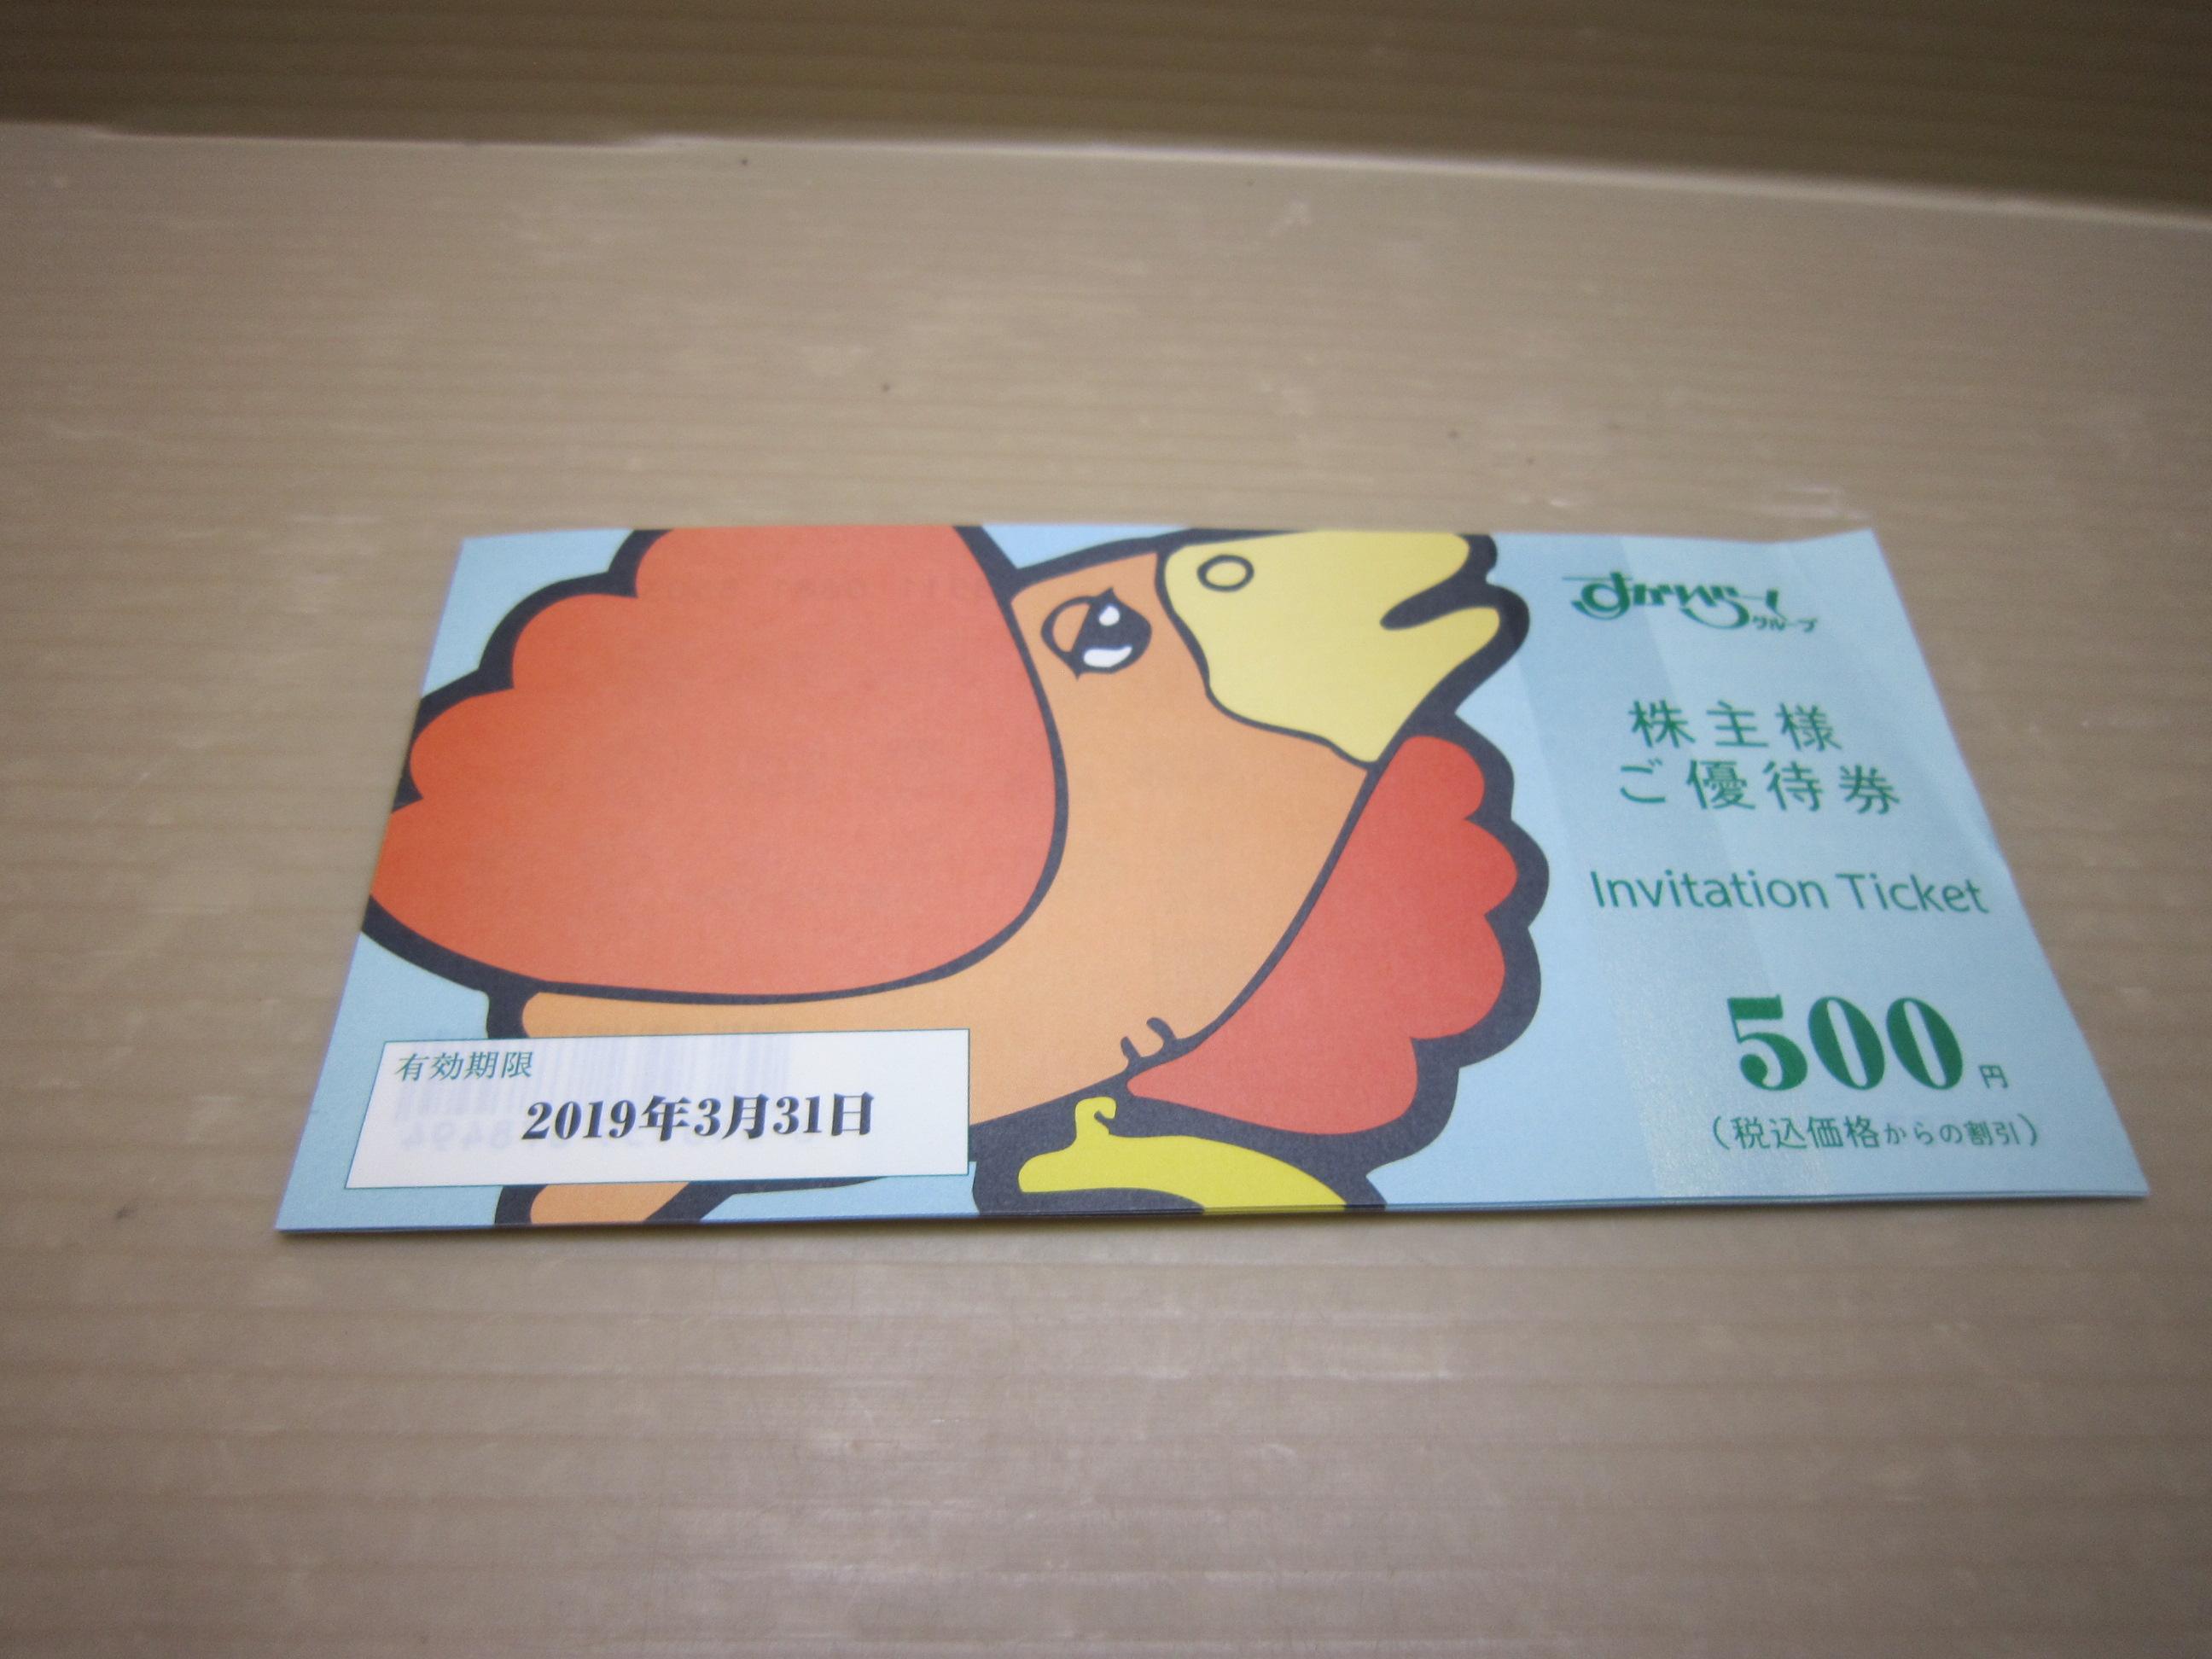 daa8b594ed2a ジャム鳥取店|すかいらーくグループ株主ご優待券500円をお売りいただき ...